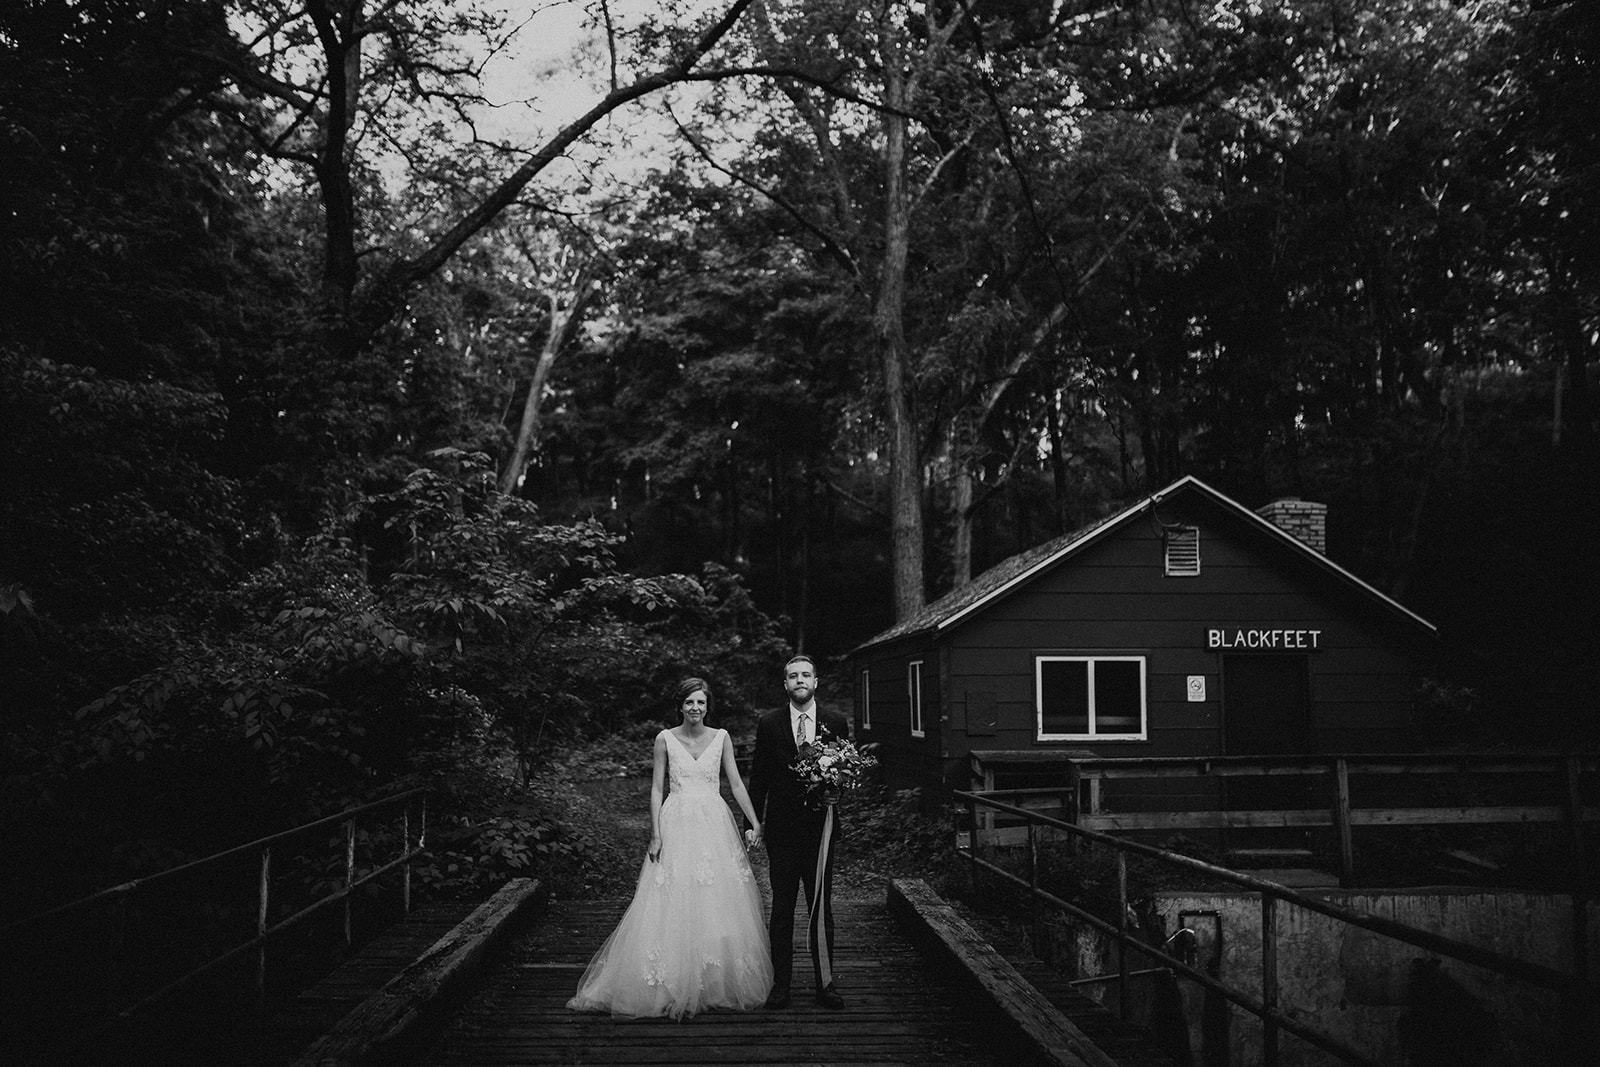 camp_wokanda_peoria_illinois_wedding_photographer_wright_photographs_bliese_0814.jpg